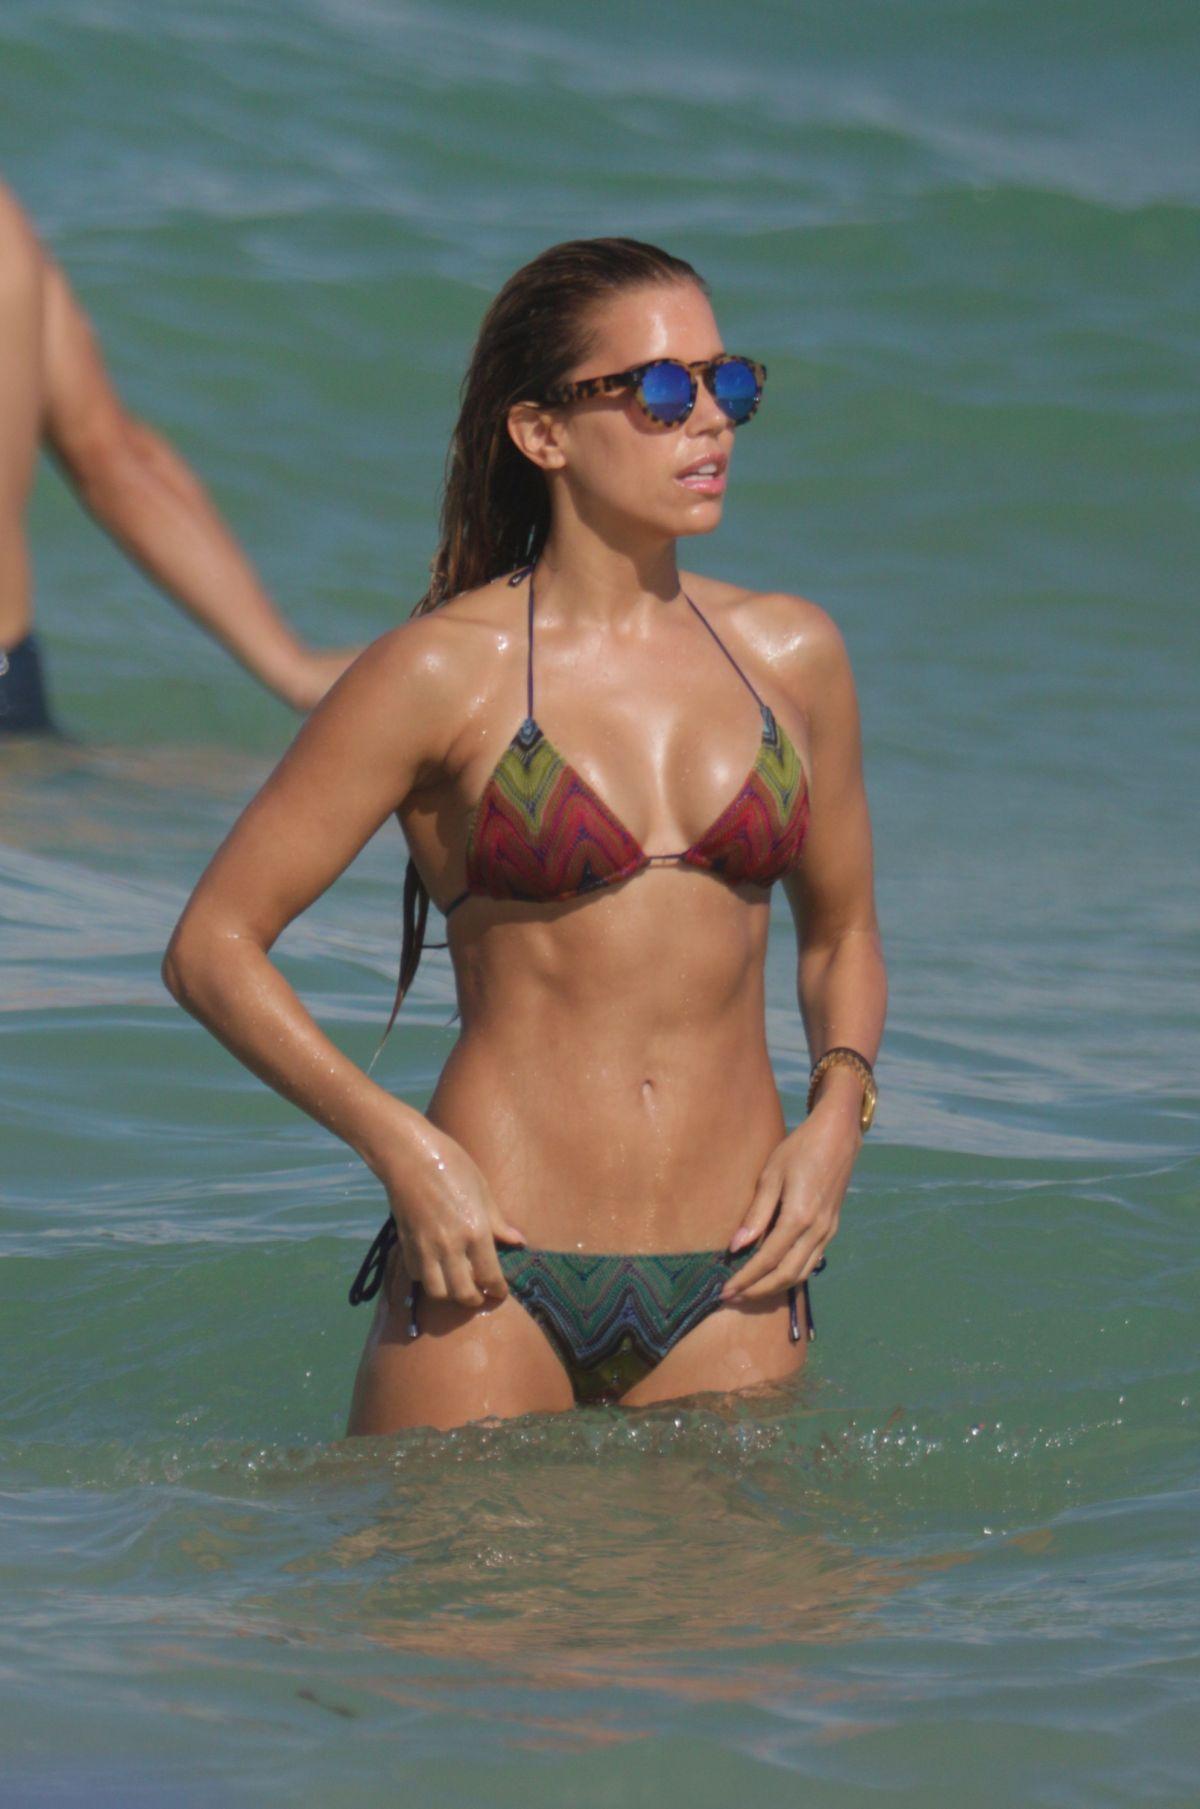 Ongekend SYLVIE MEIS in Bikini at a Beach in Miami 12/29/2015 – HawtCelebs JN-91